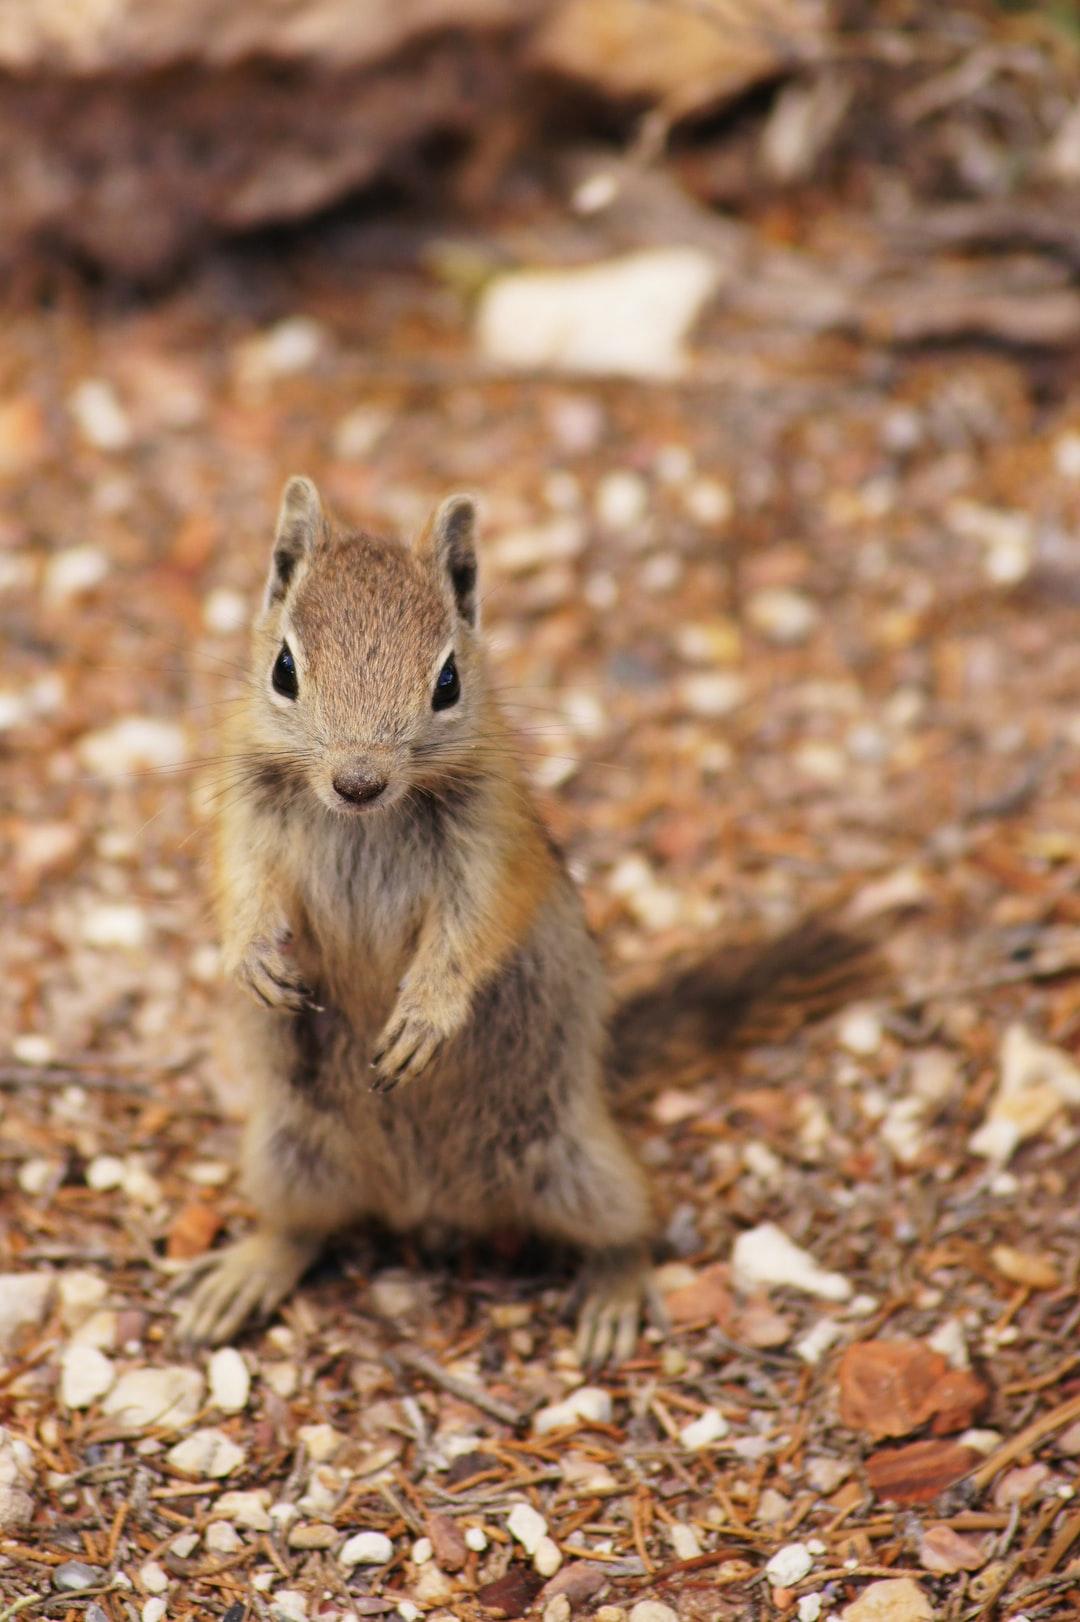 A little chipmunk at Bryce National Park